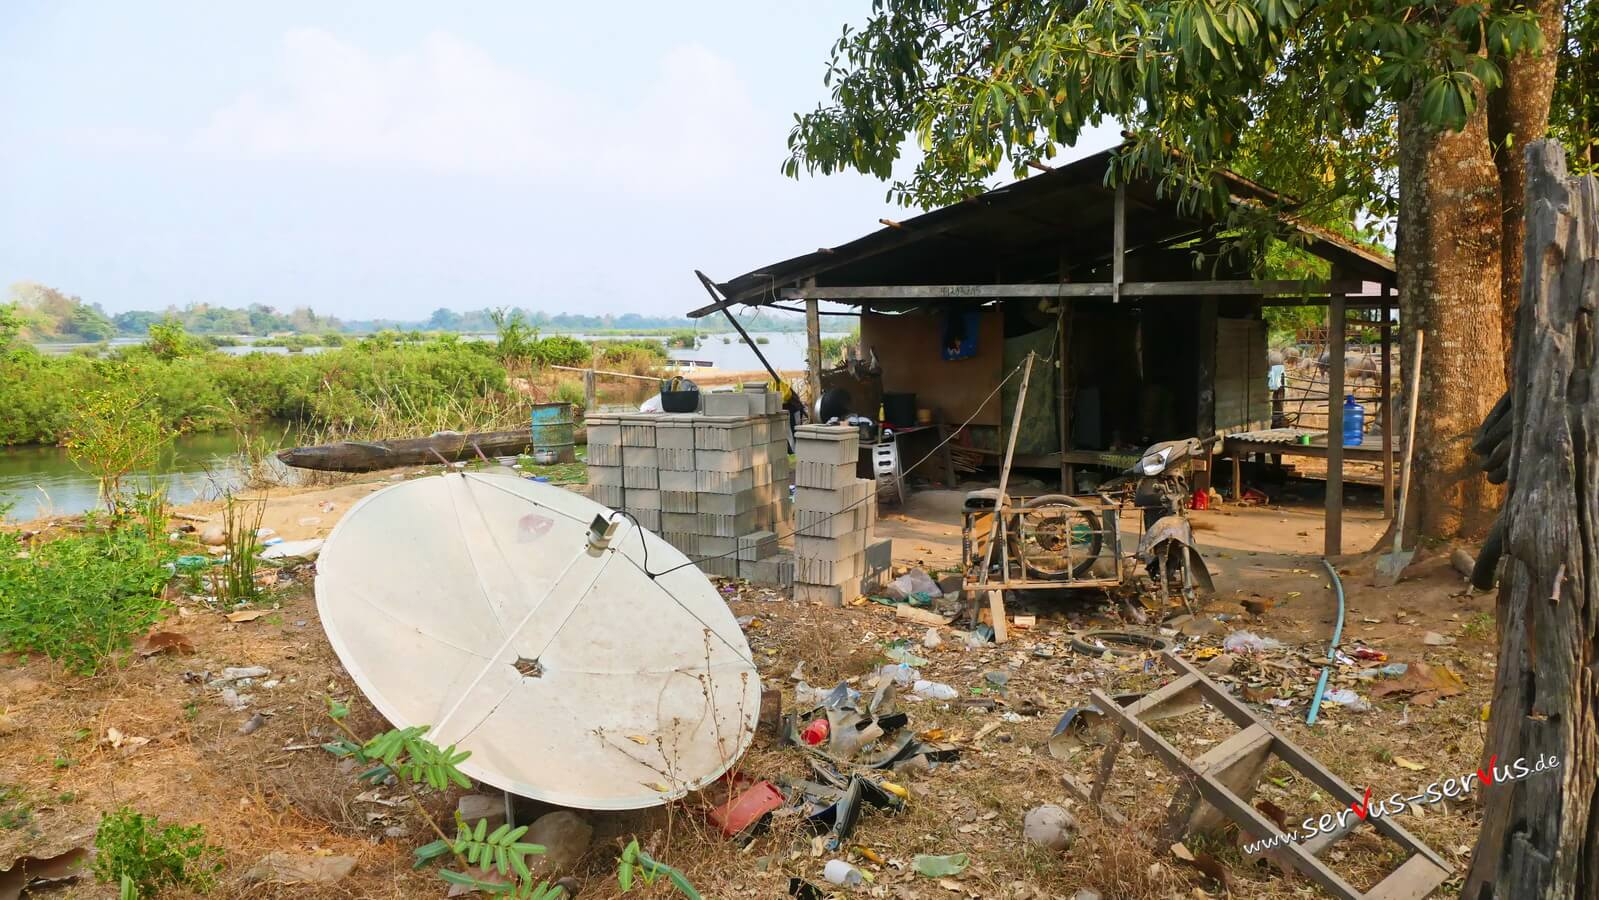 Don Det, 4000 Inseln, Laos, Hütte, Müll